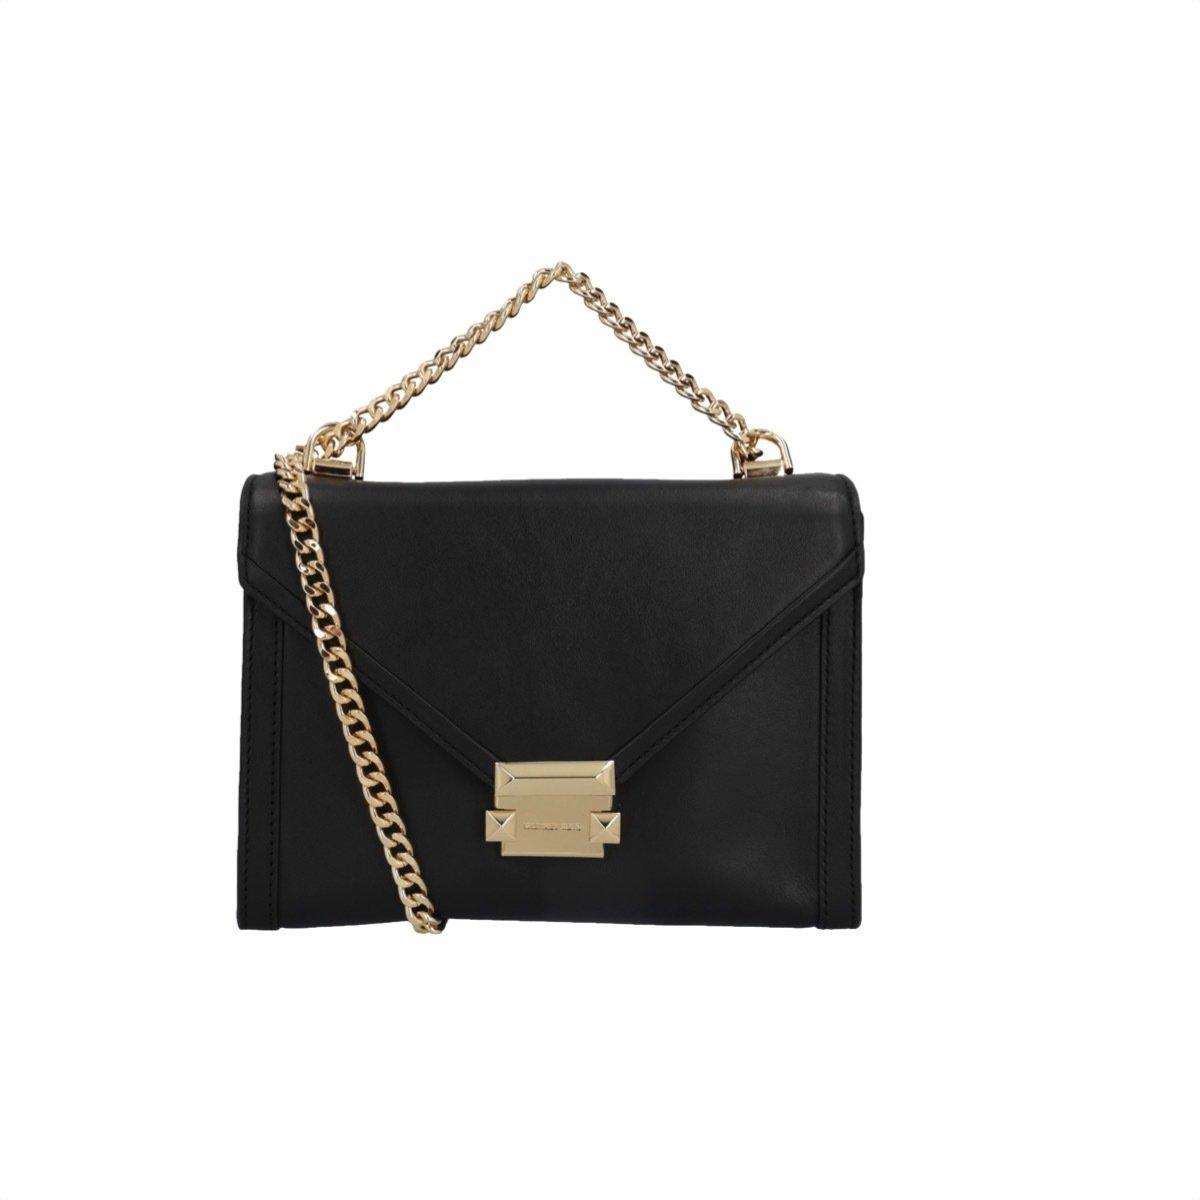 MICHAEL KORS - Whitney LG Shoulder Bag - Black